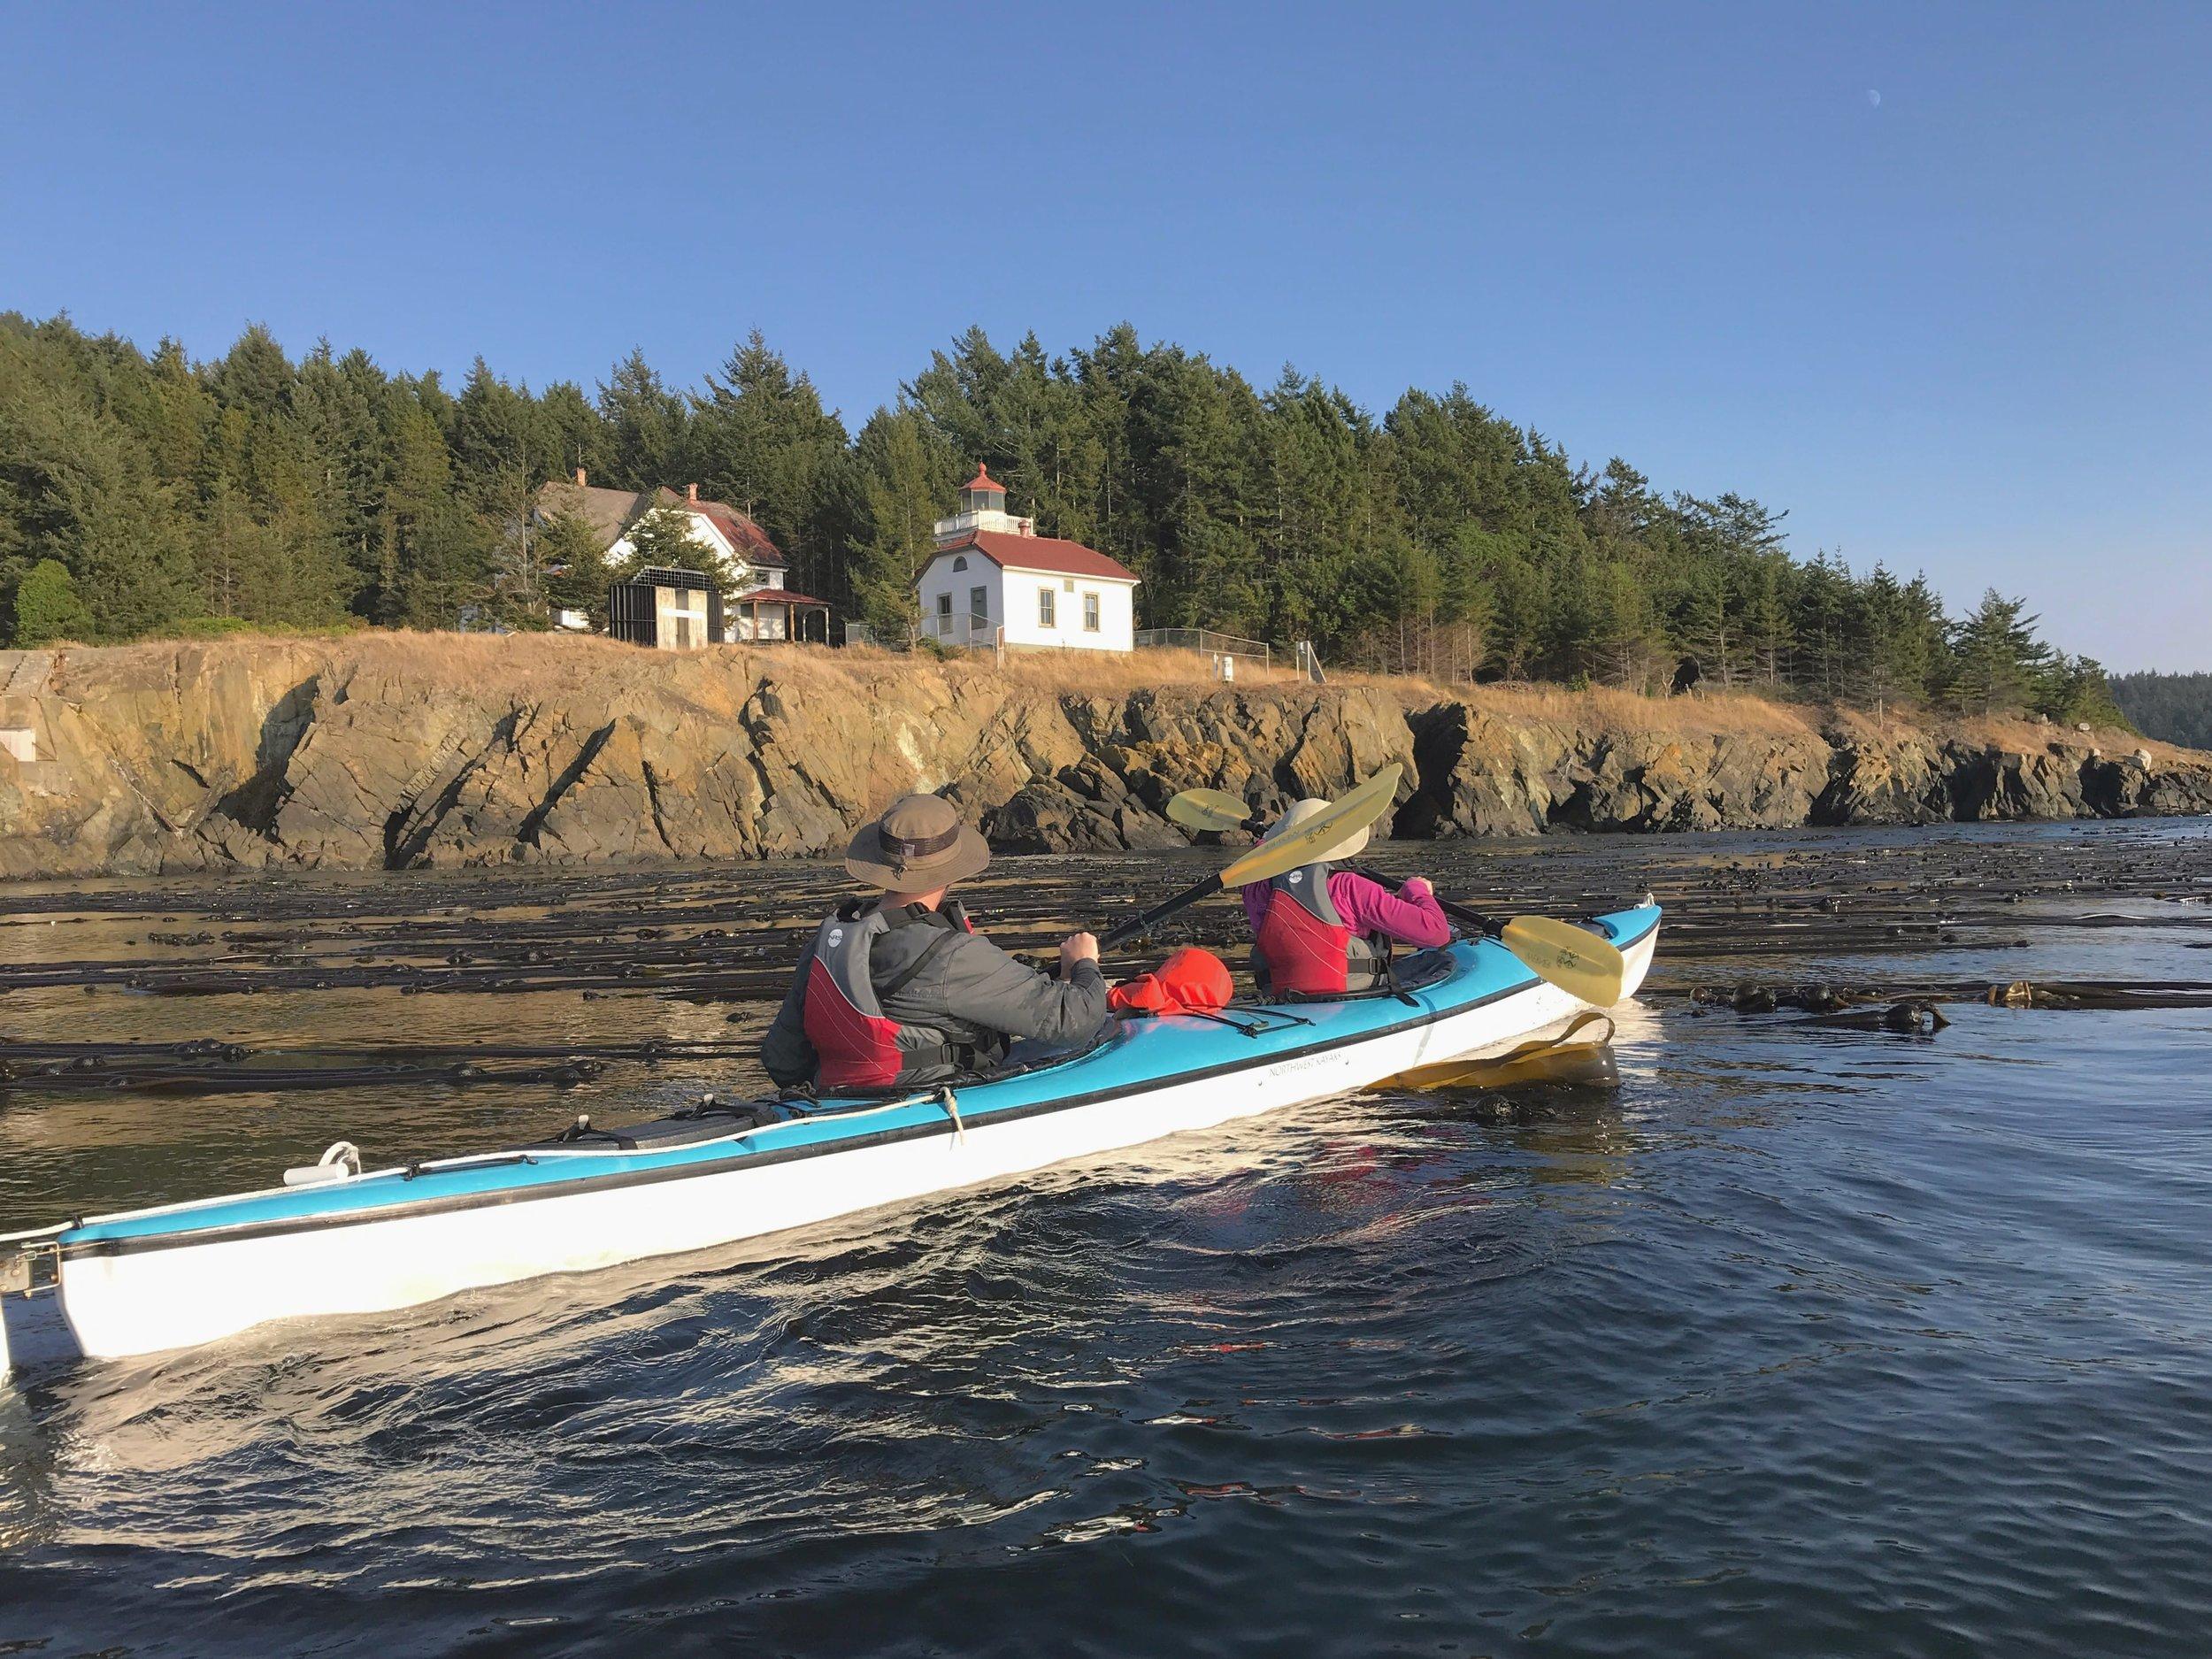 Kayaking past Burrows Island Lighthouse